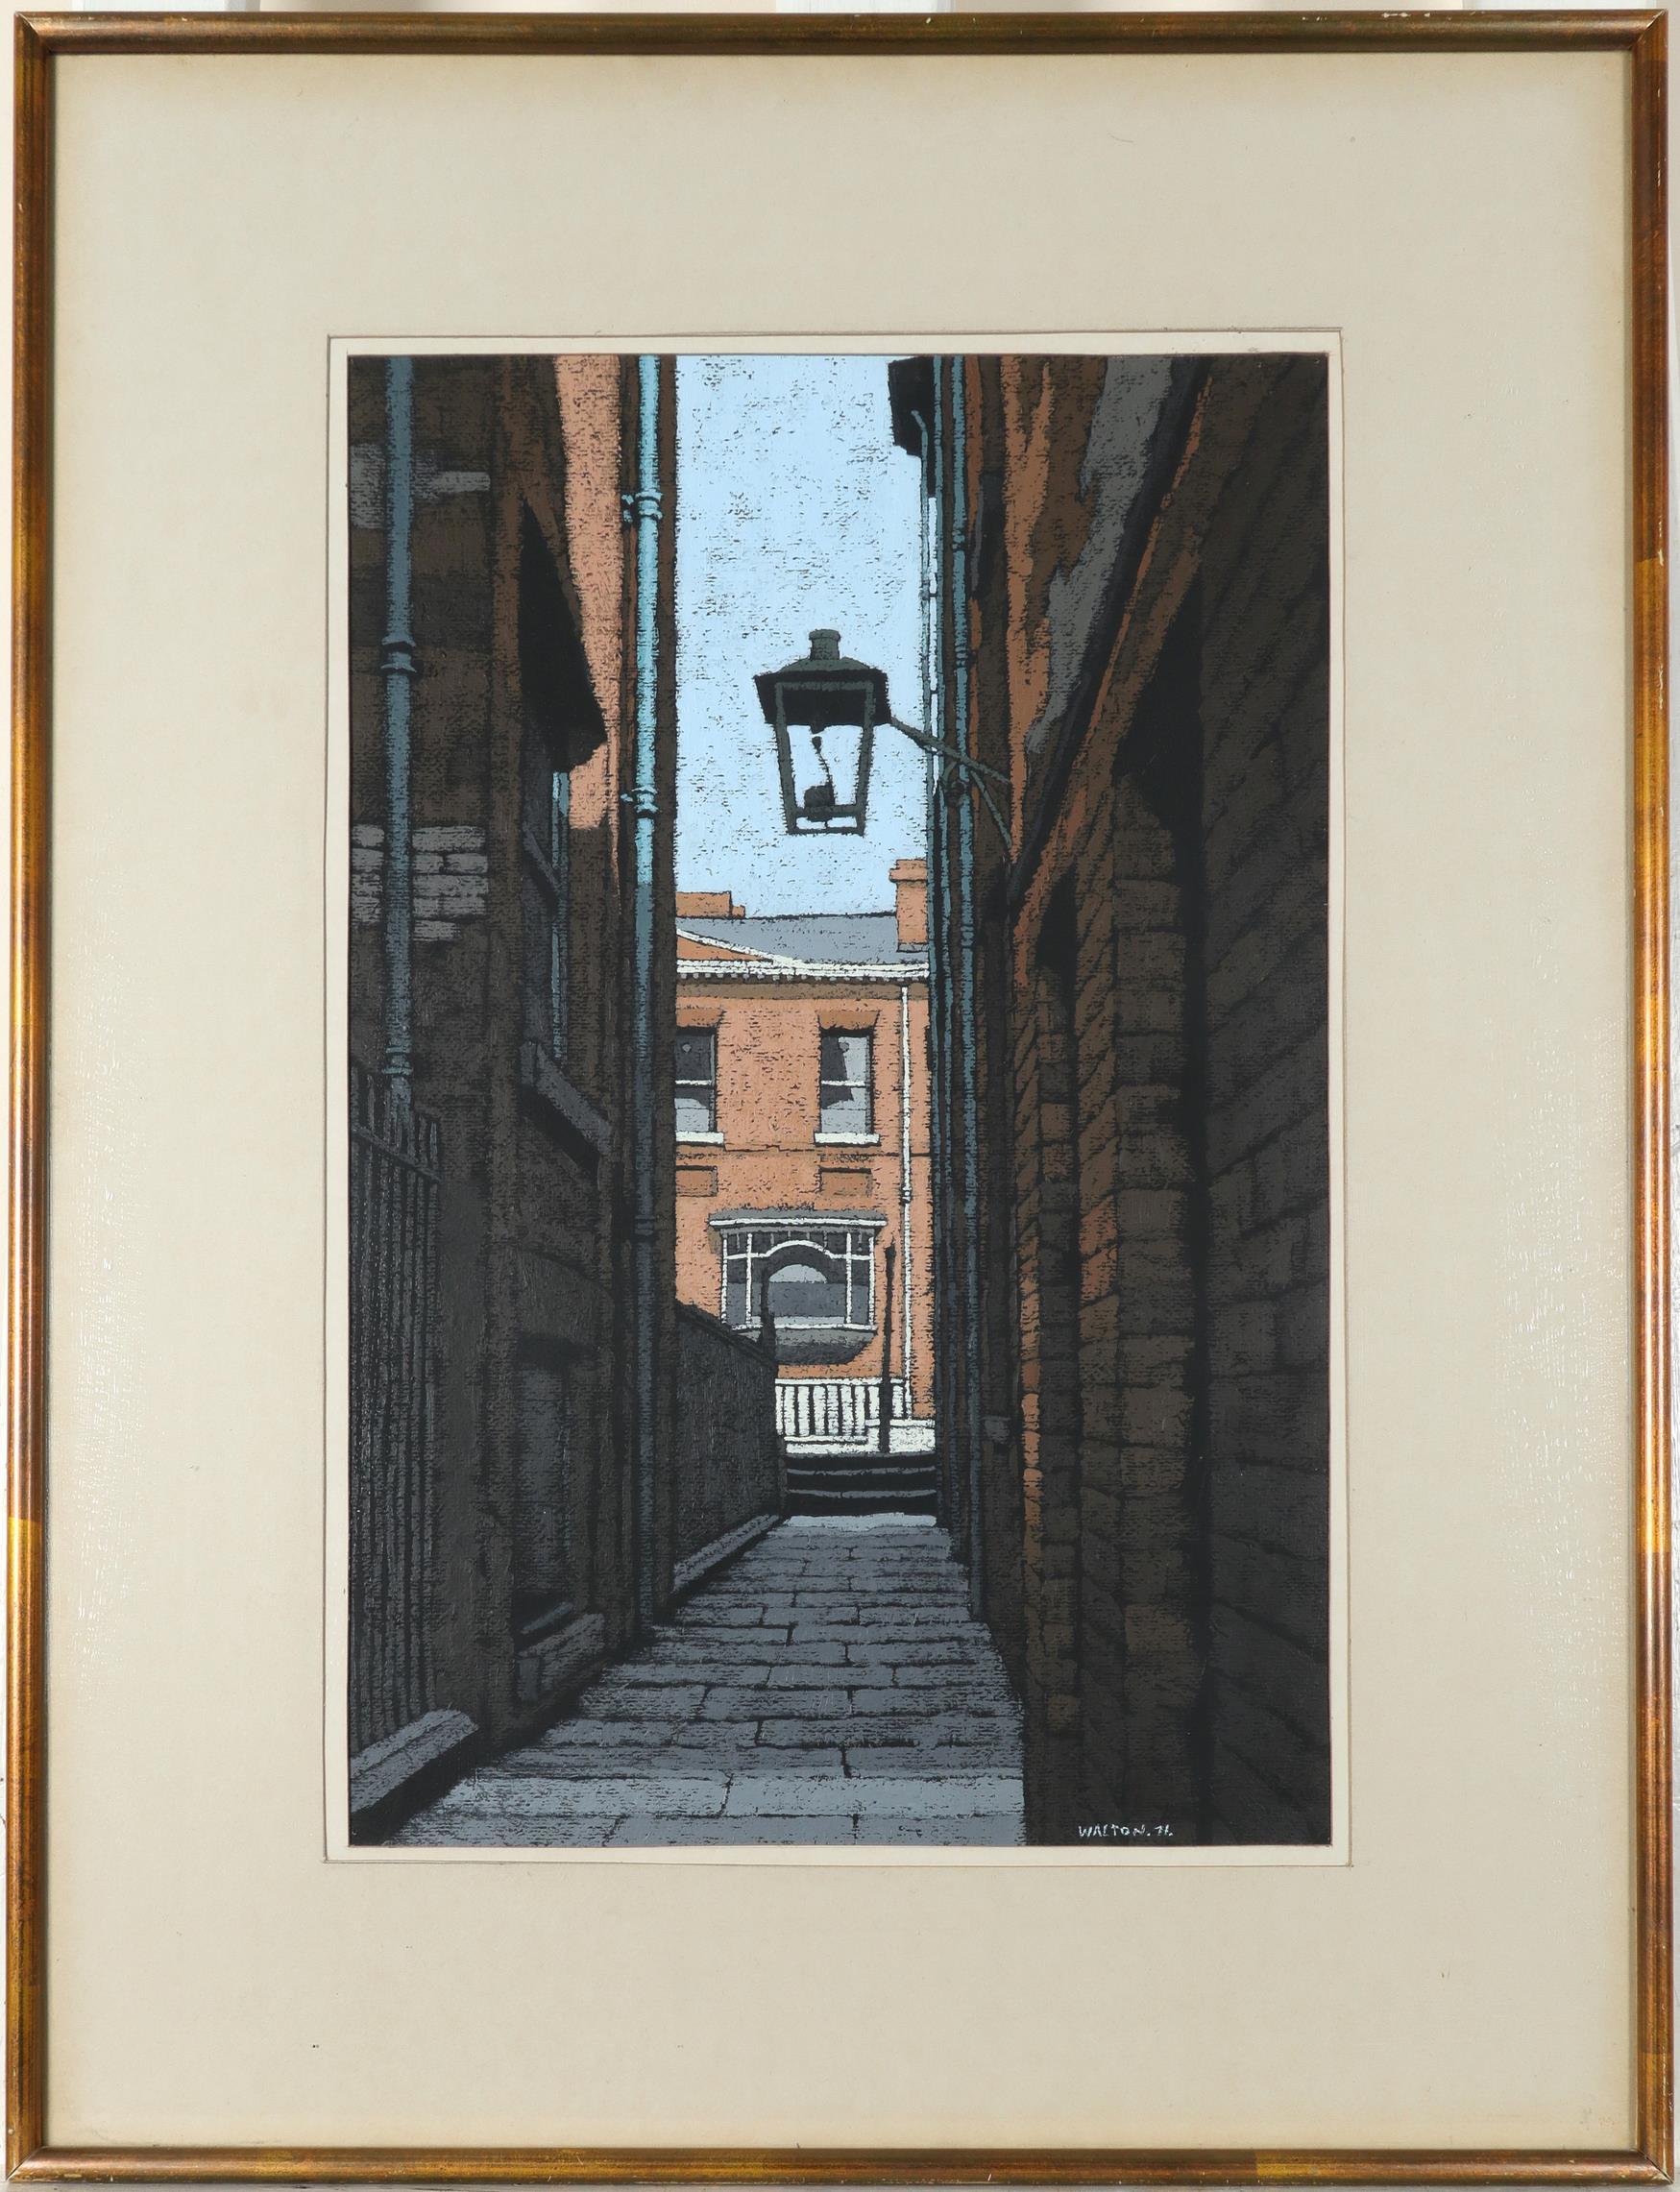 ‡Stuart Walton (b.1933) Street scene Signed and dated WALTON.71. (lower right) Oil on board 44.8 x - Image 3 of 5